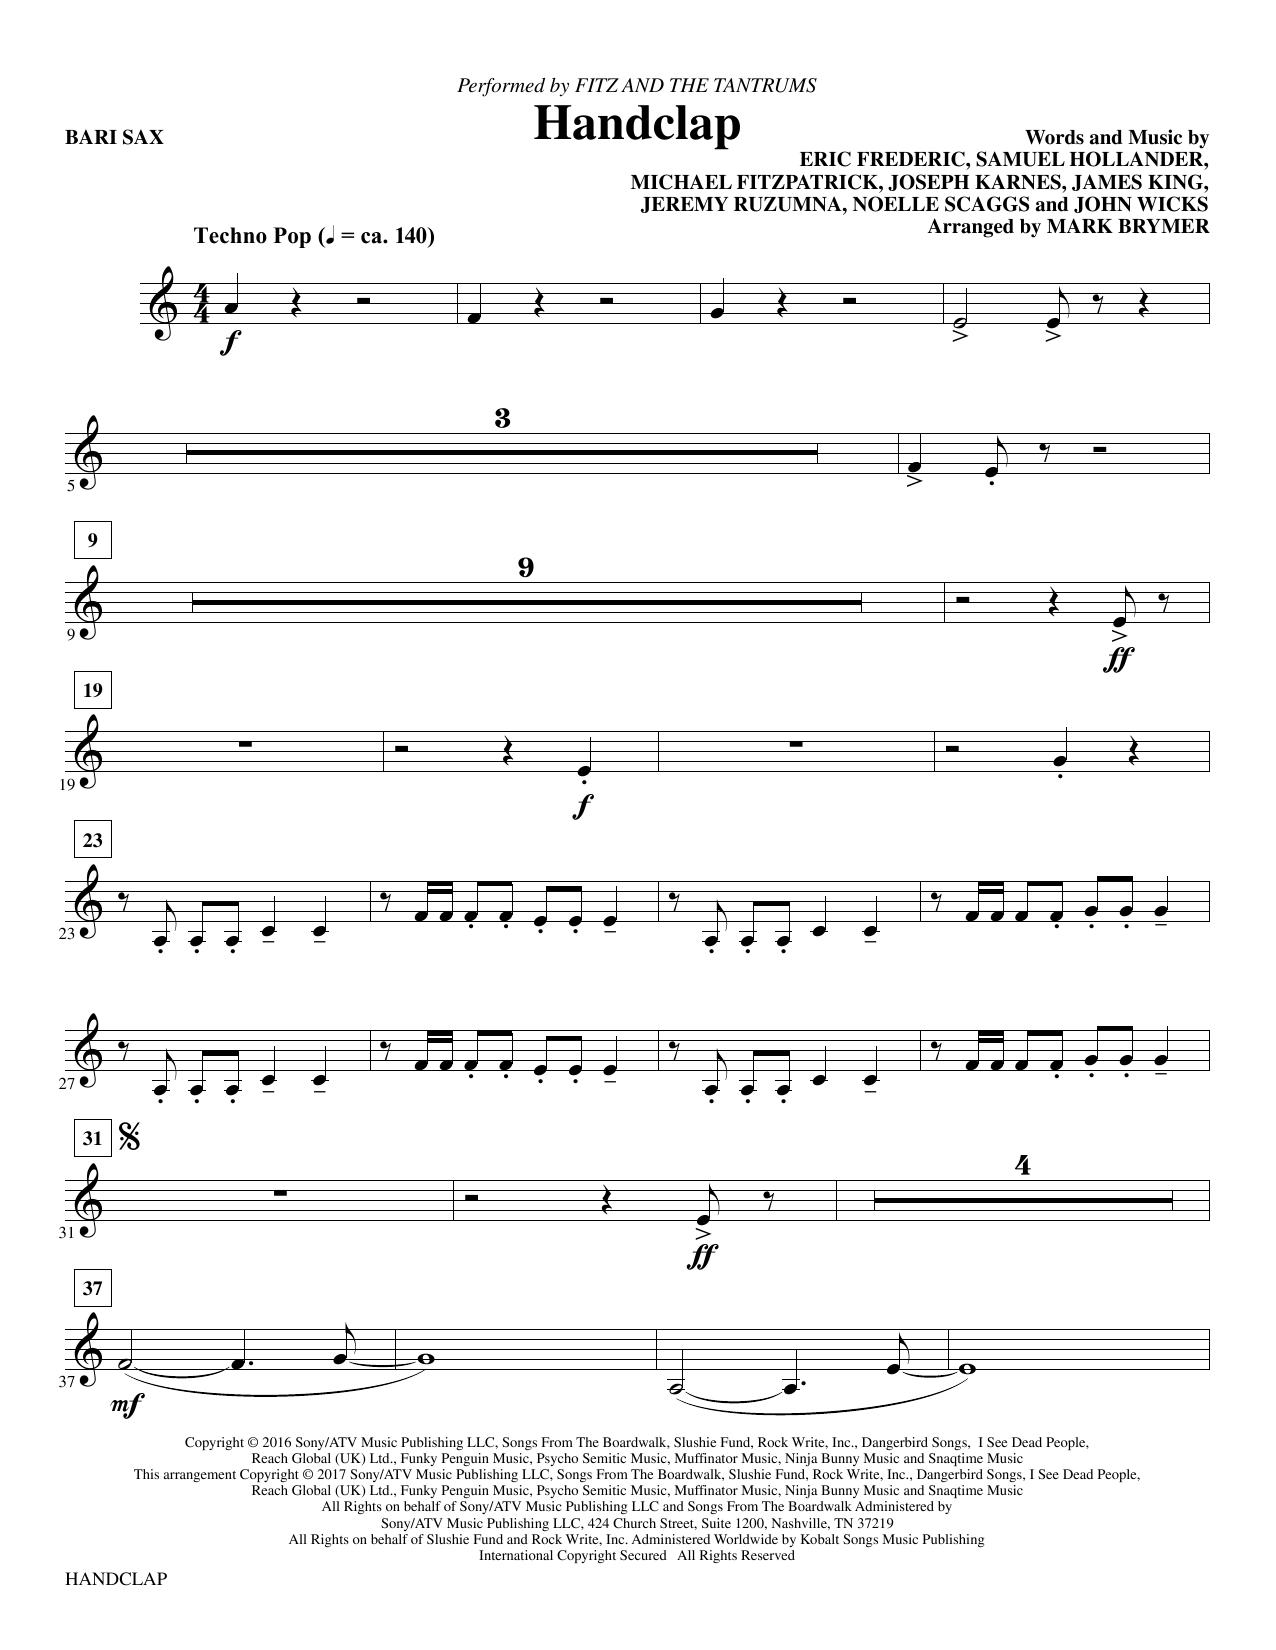 HandClap - Baritone Sax - Sheet Music at Stanton's Sheet Music